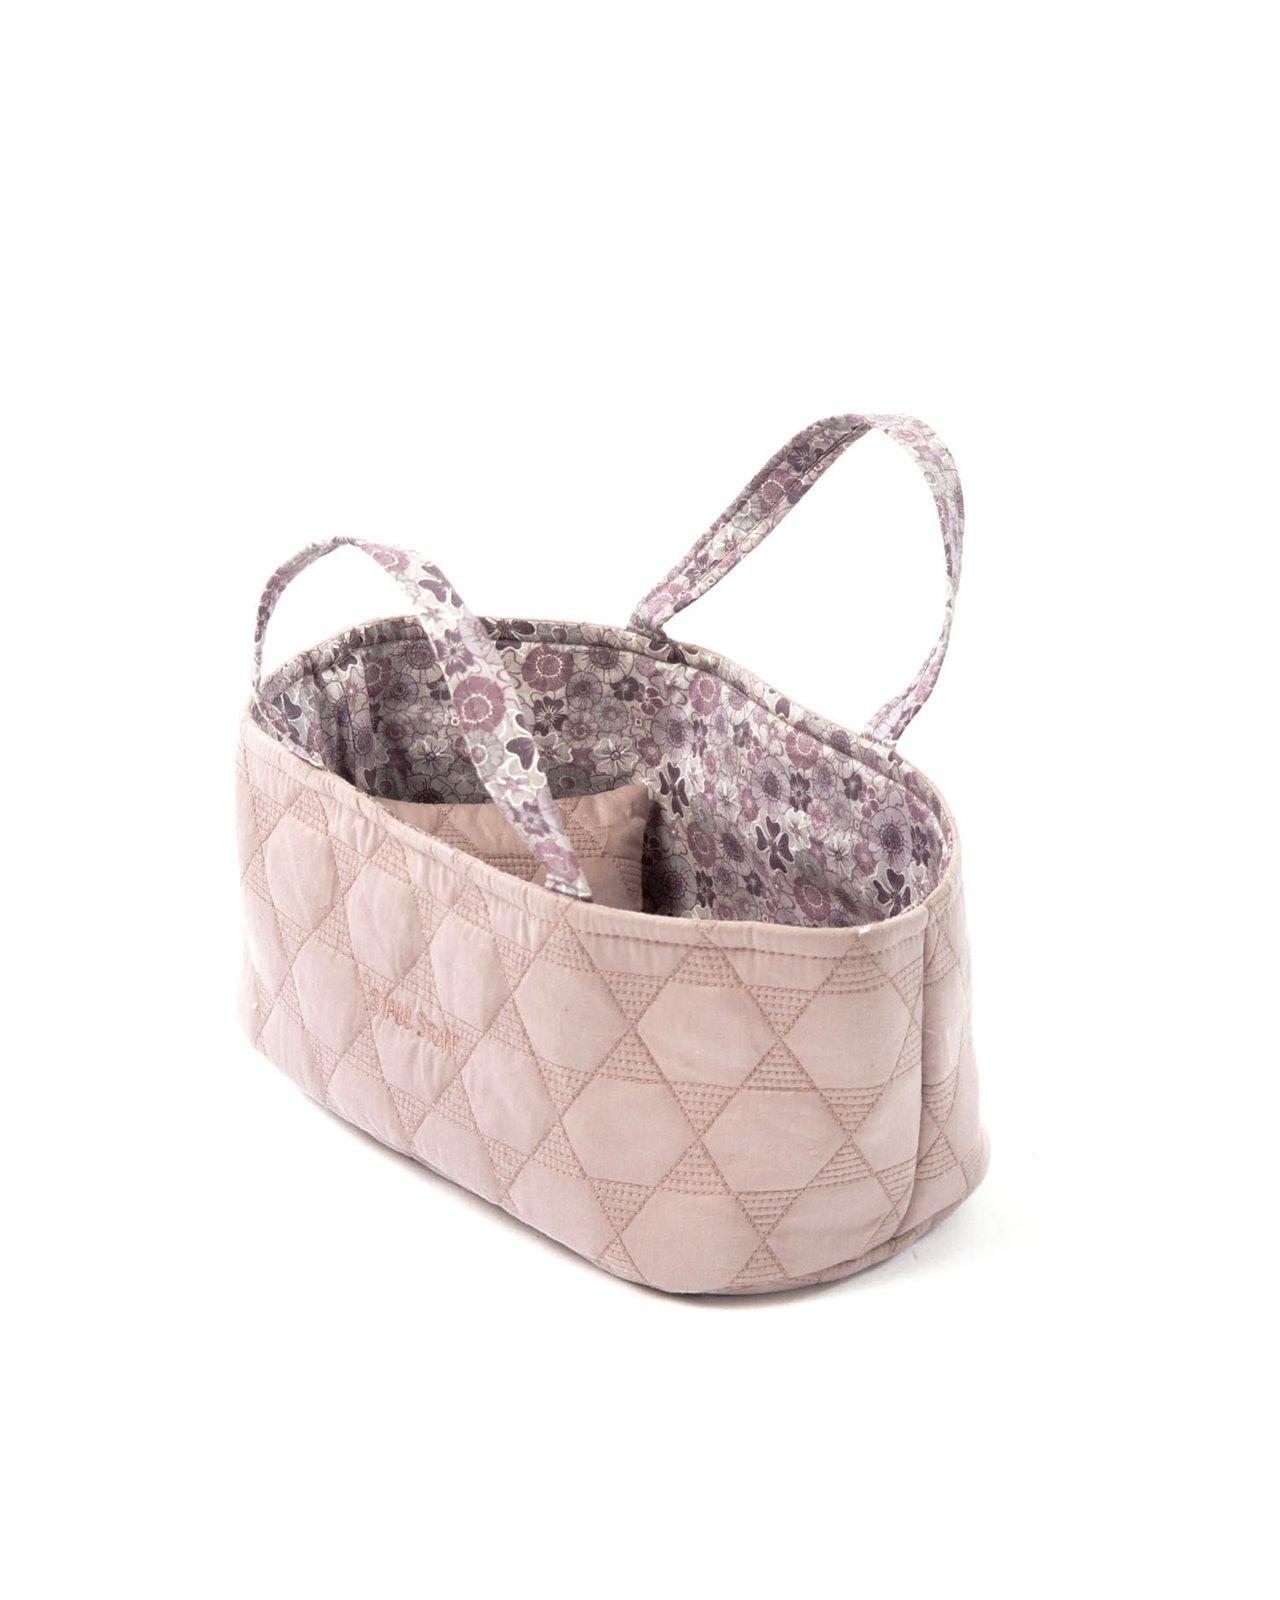 Smallstuff - Small Doll Basket - Rose